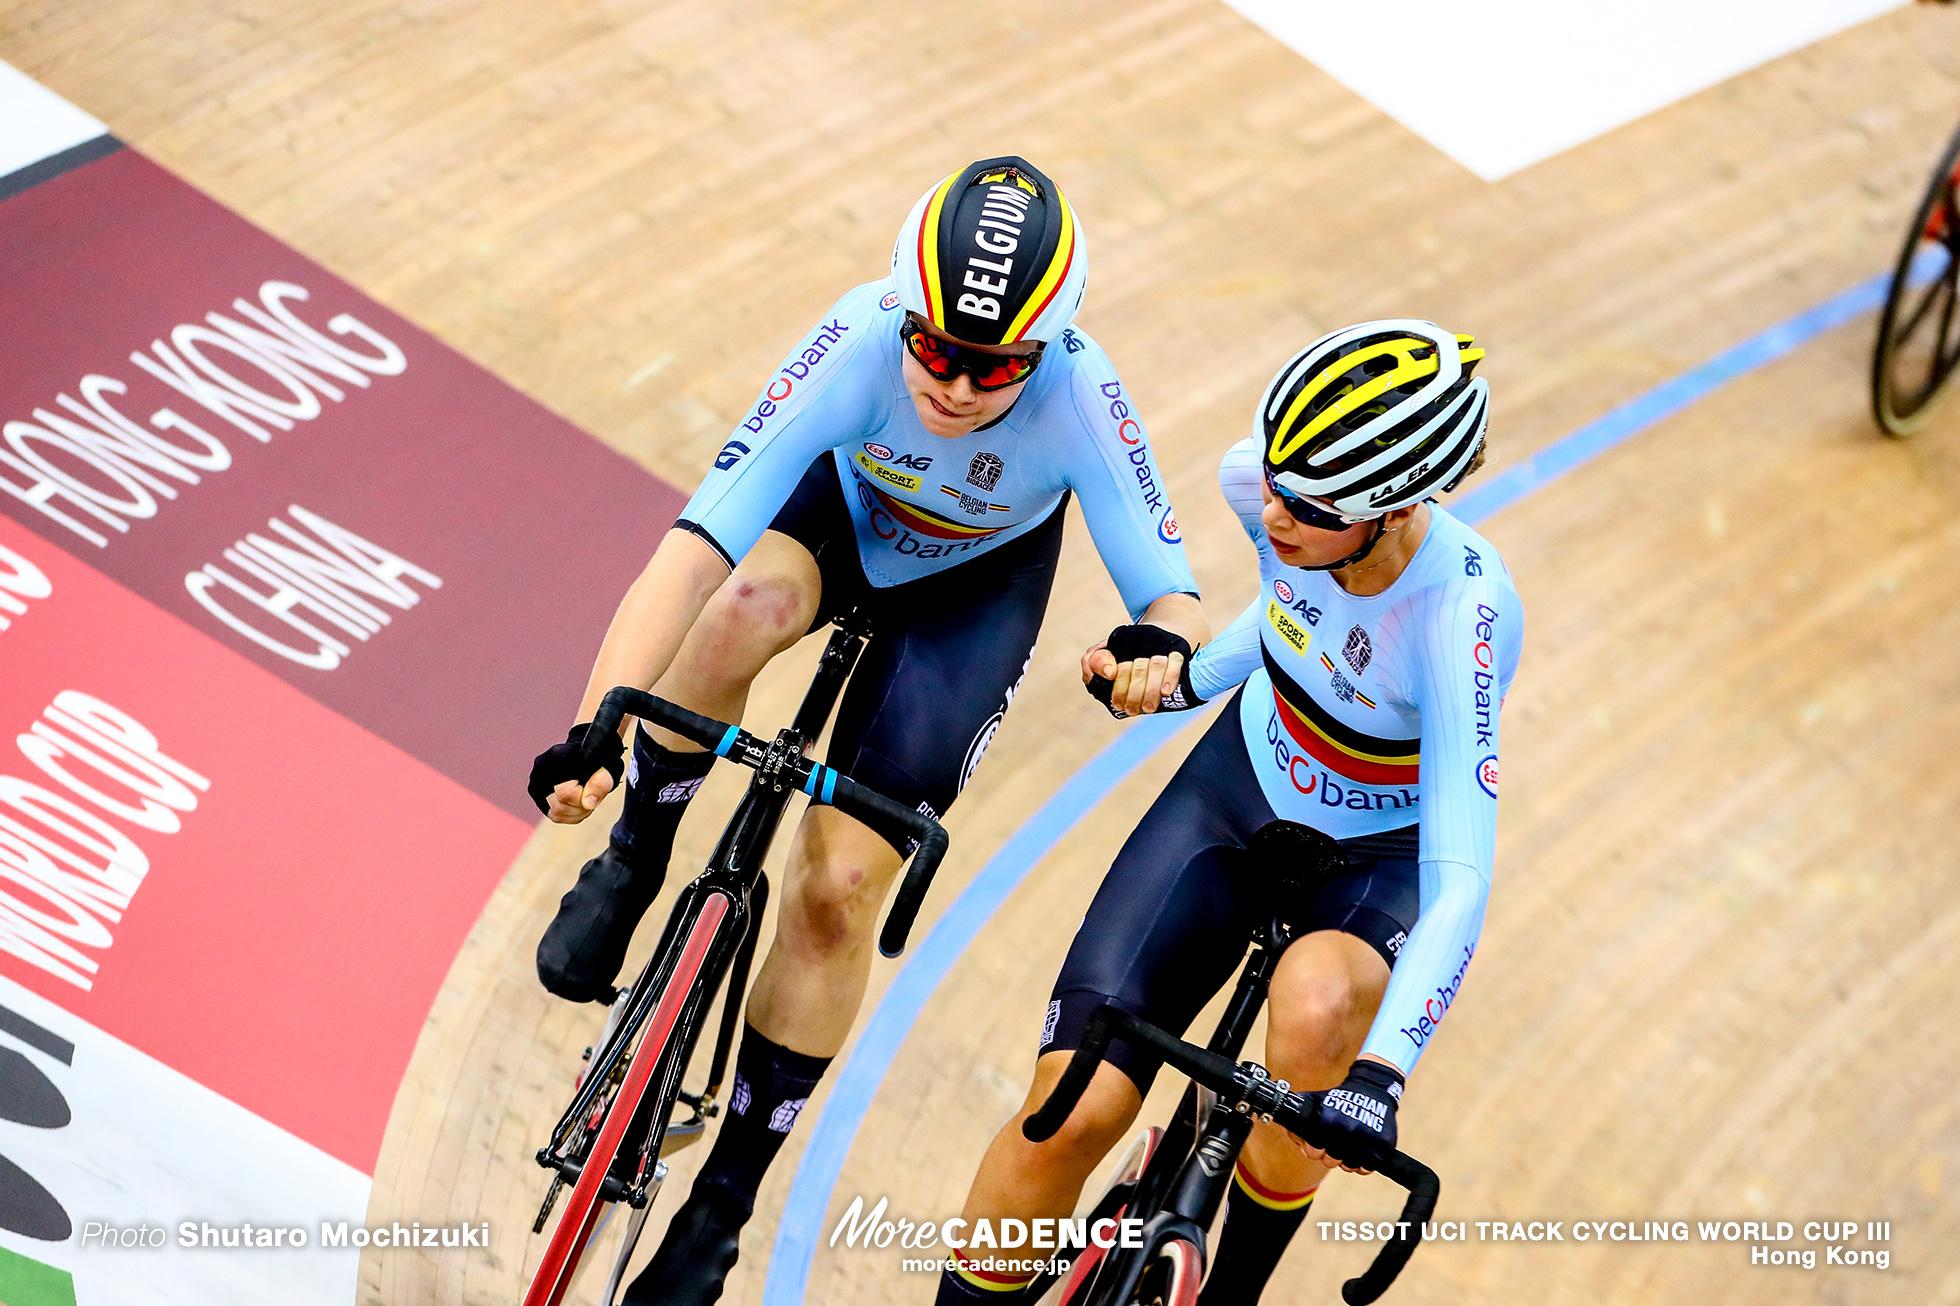 Women's Madison / TISSOT UCI TRACK CYCLING WORLD CUP III, Hong Kong